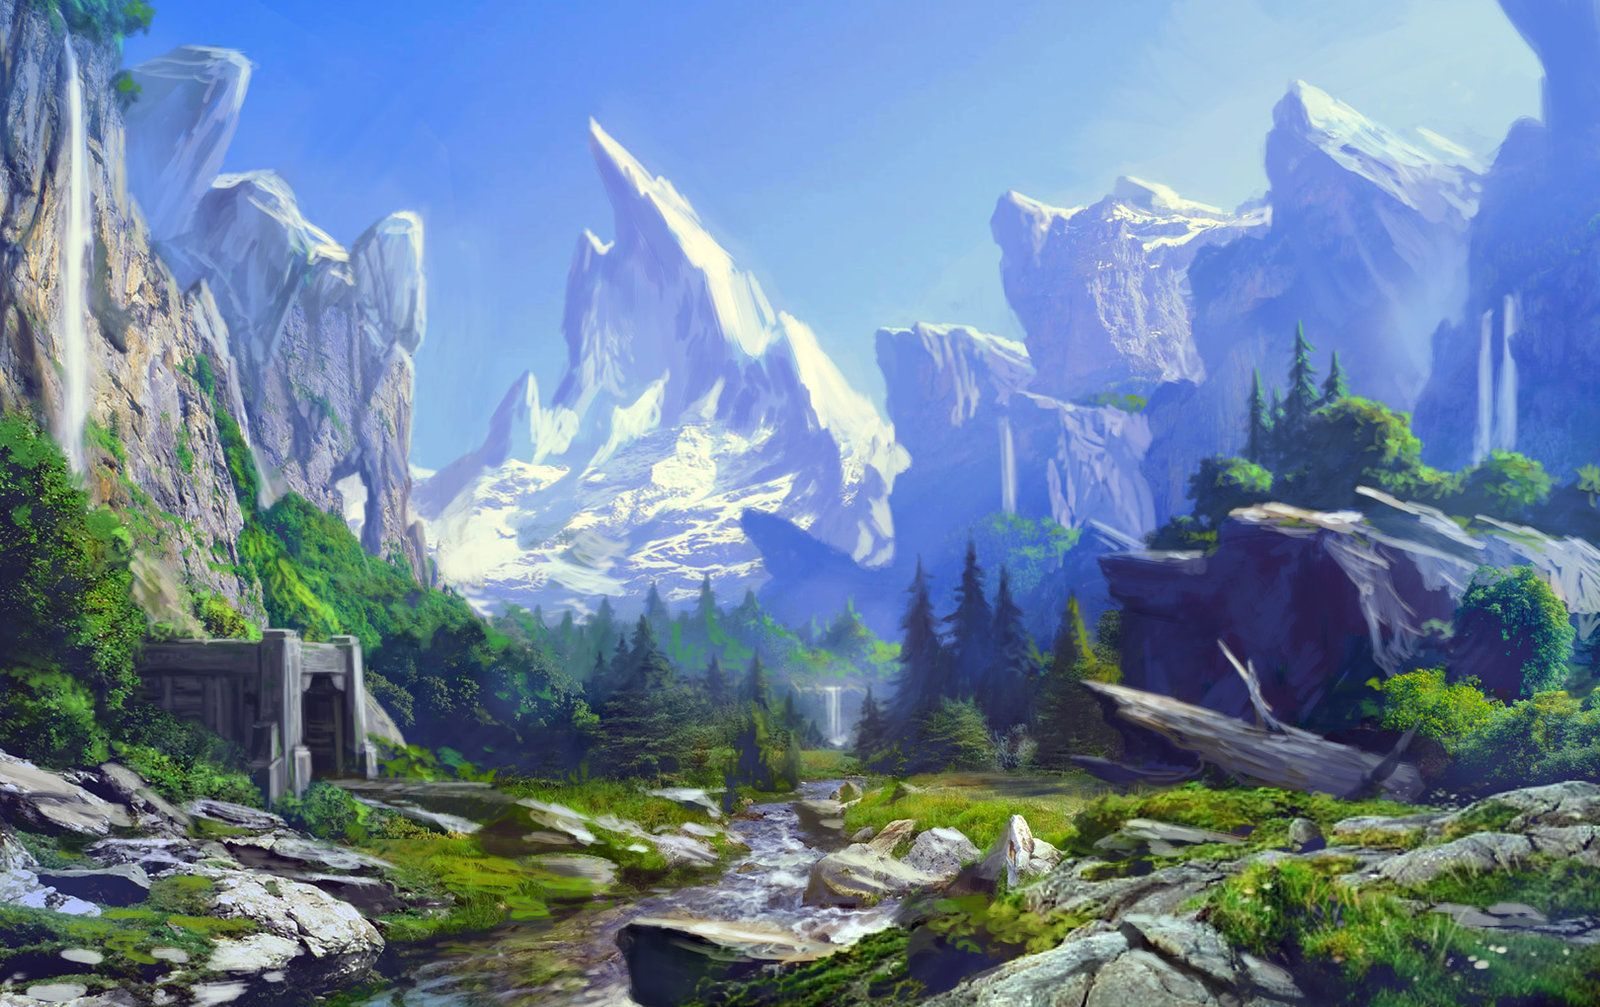 Dwarven Valley High Concept, Chris Dien on ArtStation at https://www.artstation.com/artwork/dwarven-valley-high-concept